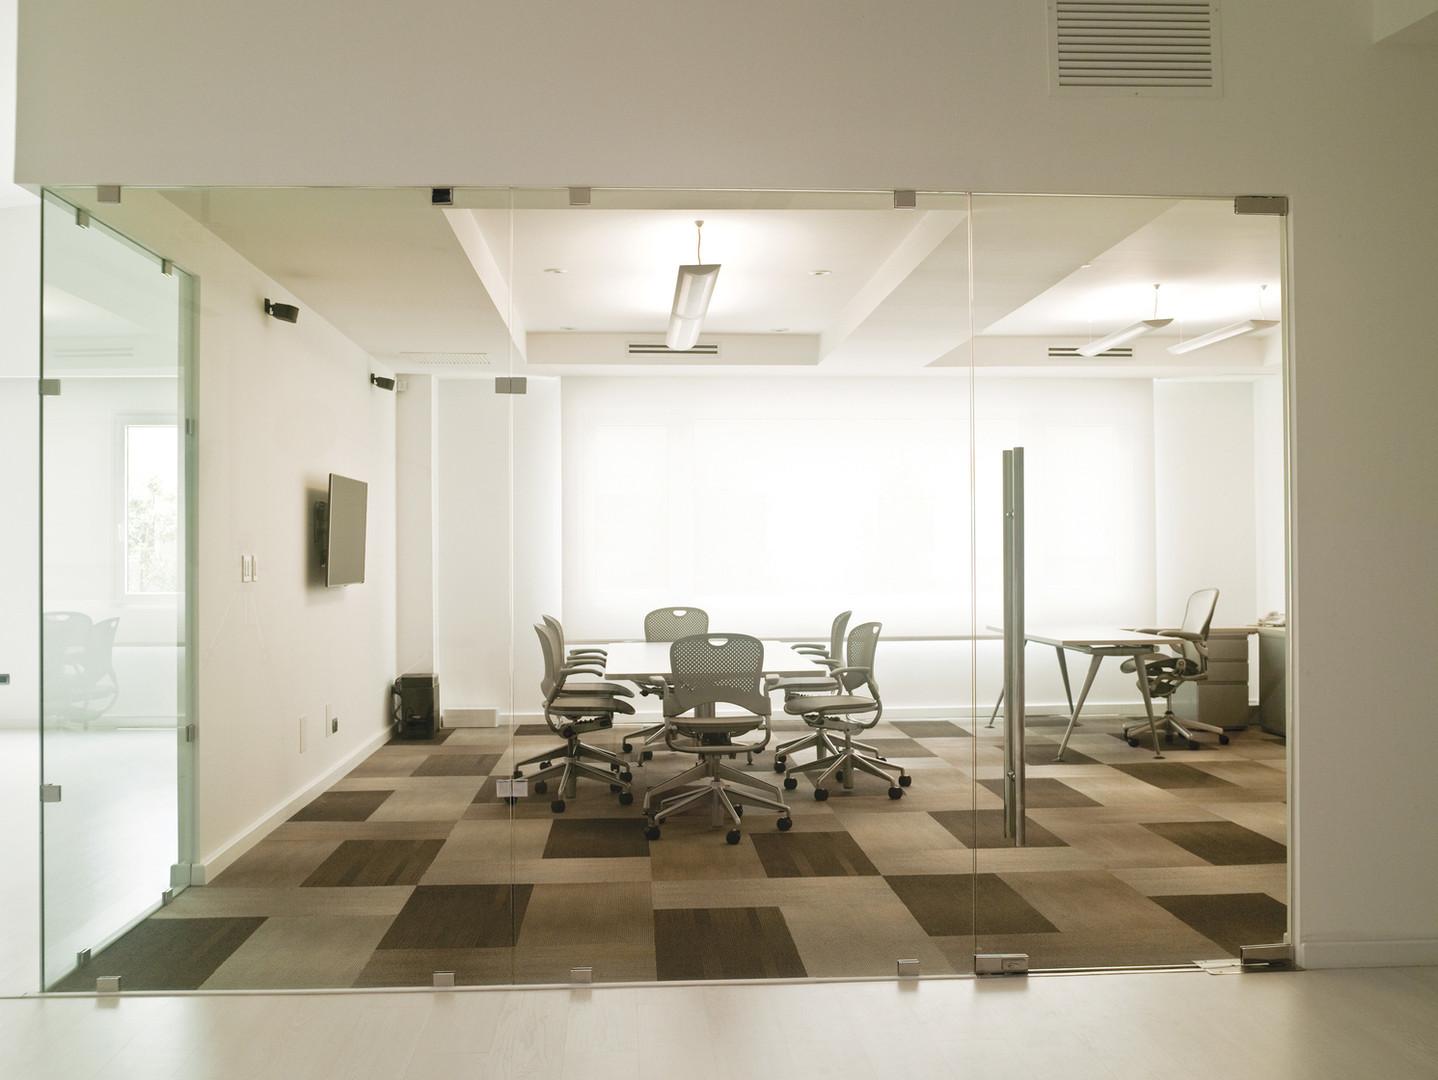 Area-Studio-03.jpg